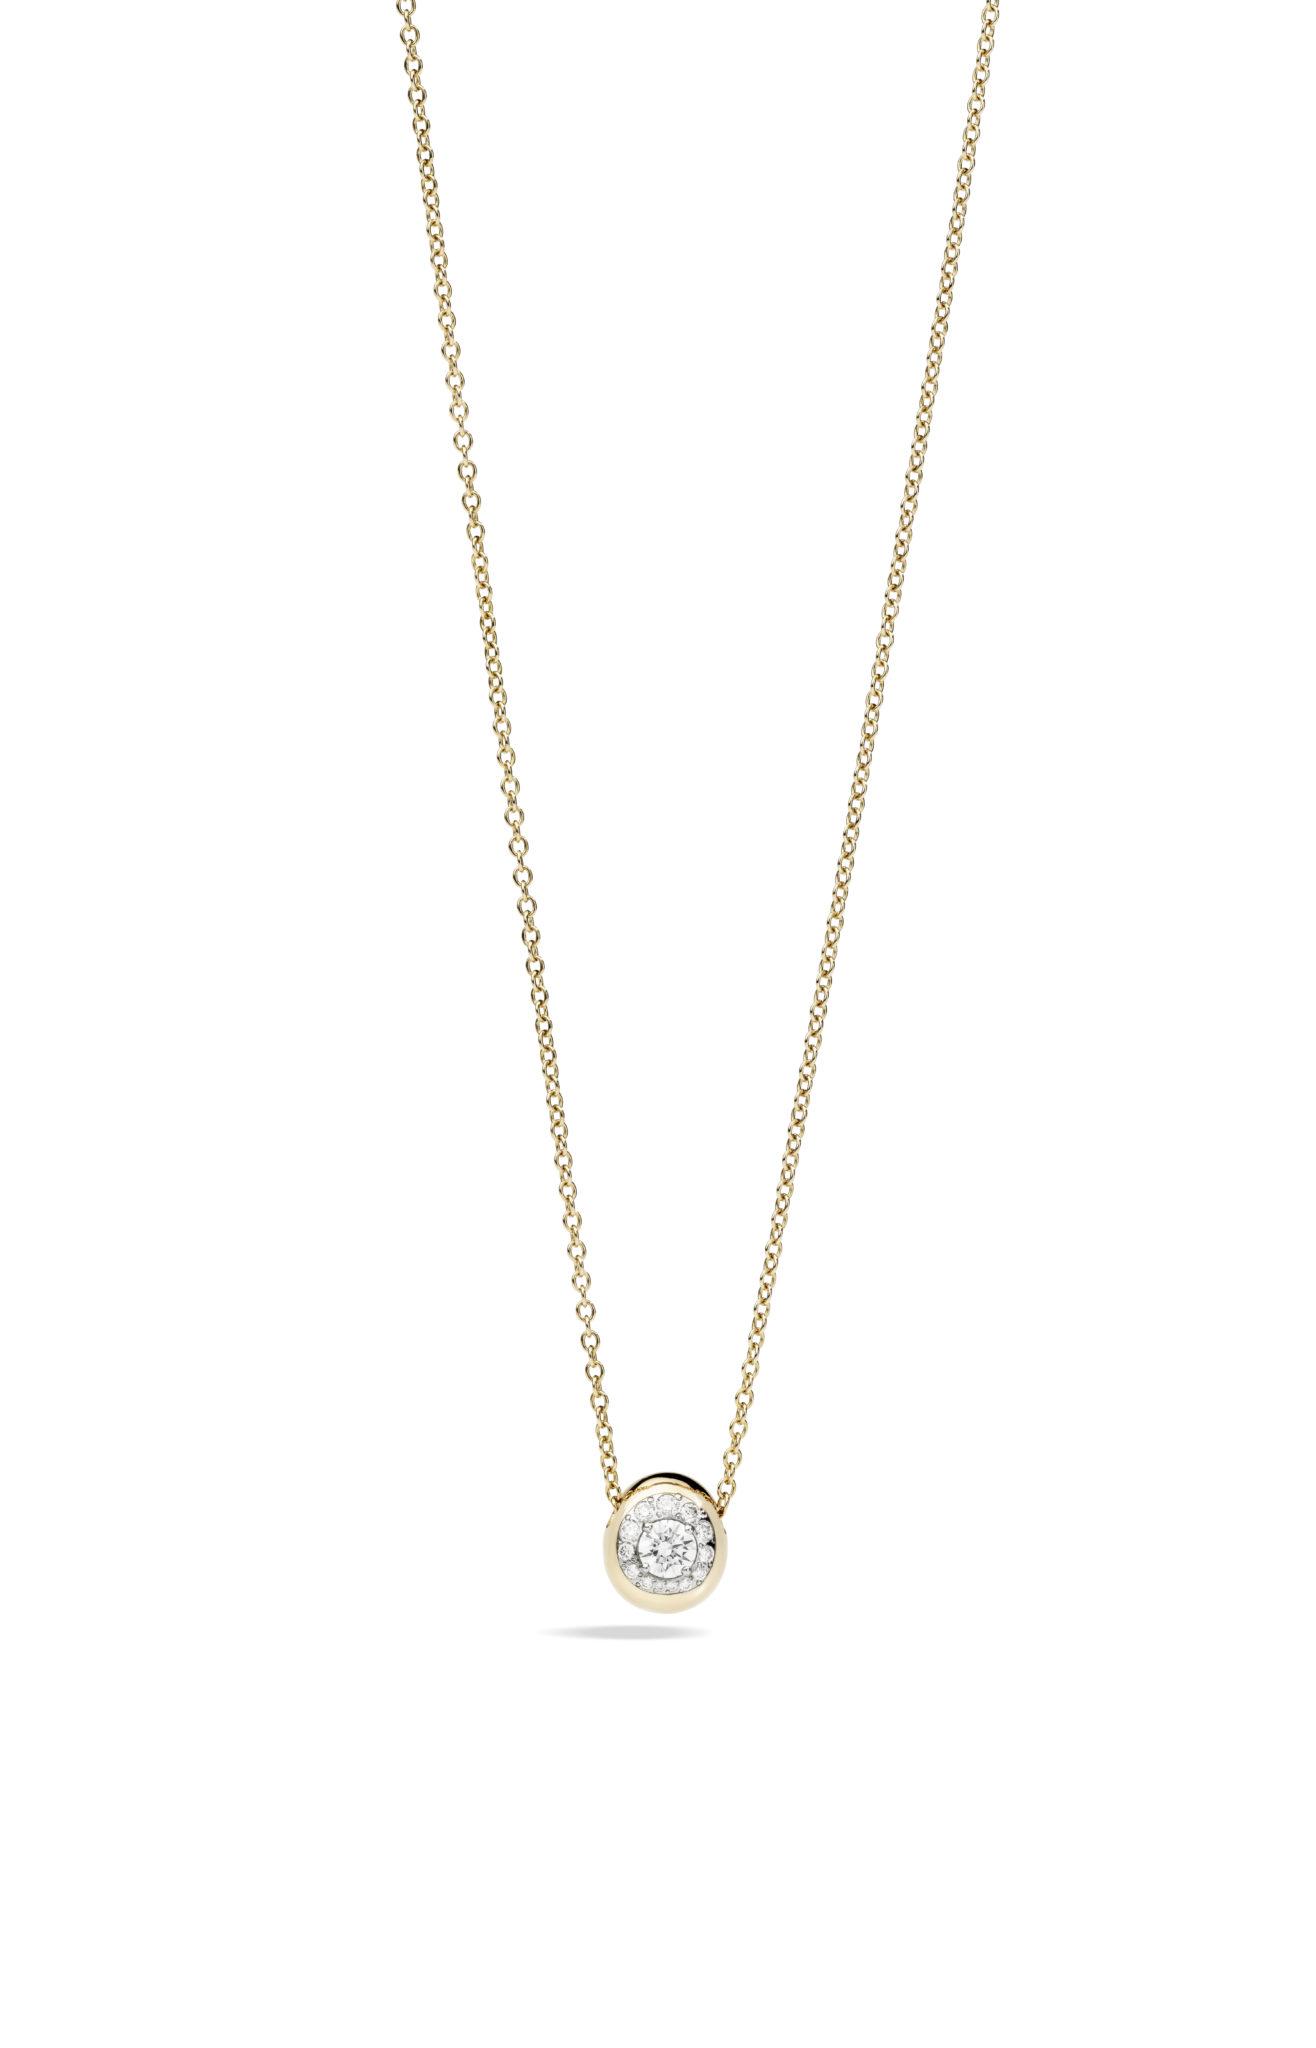 Nuvola pendant rose gold and diamonds by Pomellato